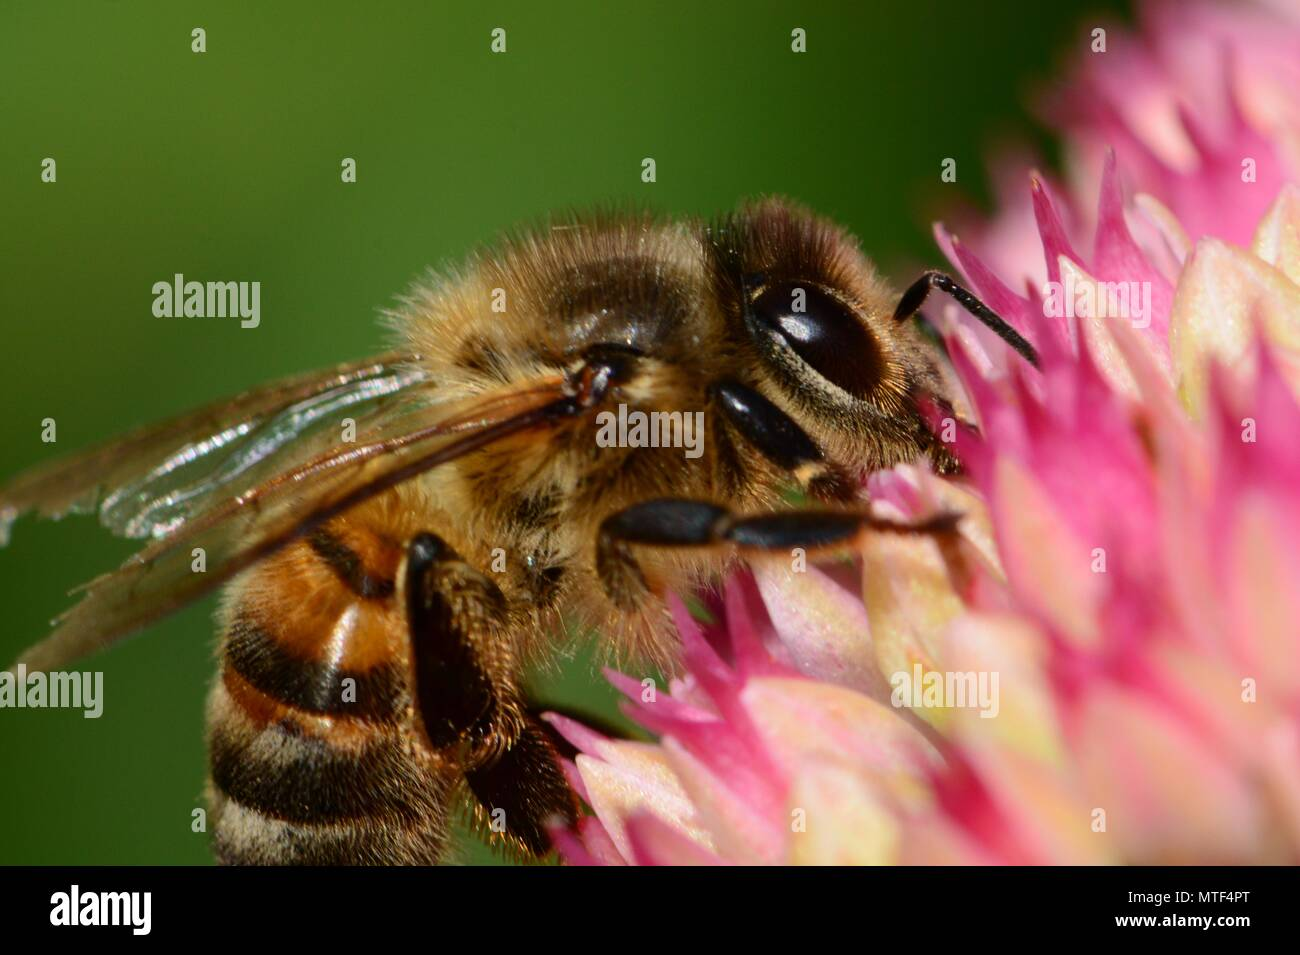 Macro shot of a honey bee pollinating a sedum flower - Stock Image